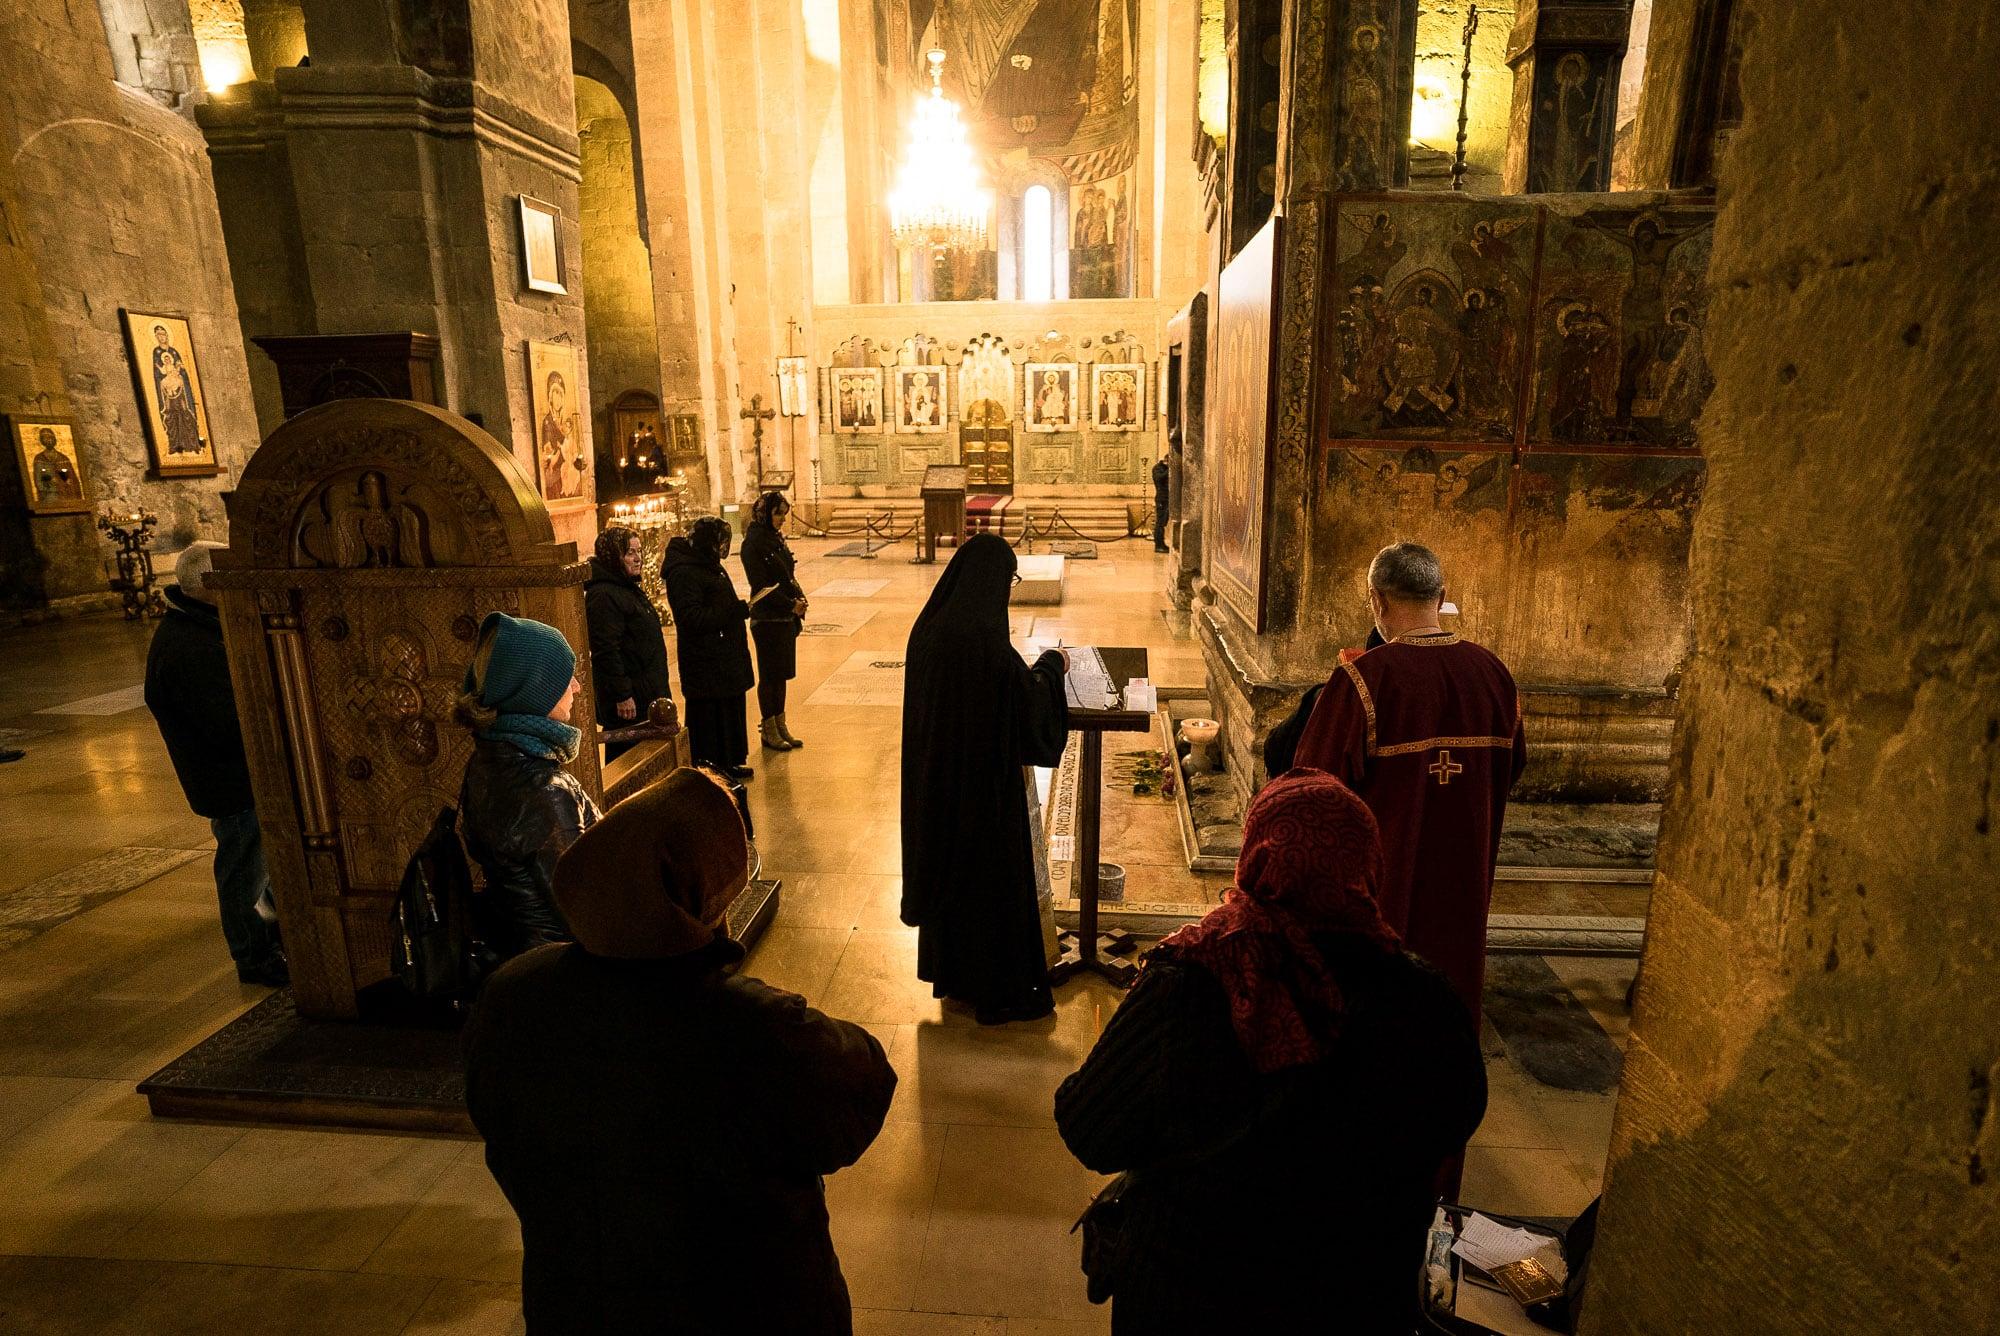 ritual in Mtskheta Cathedral